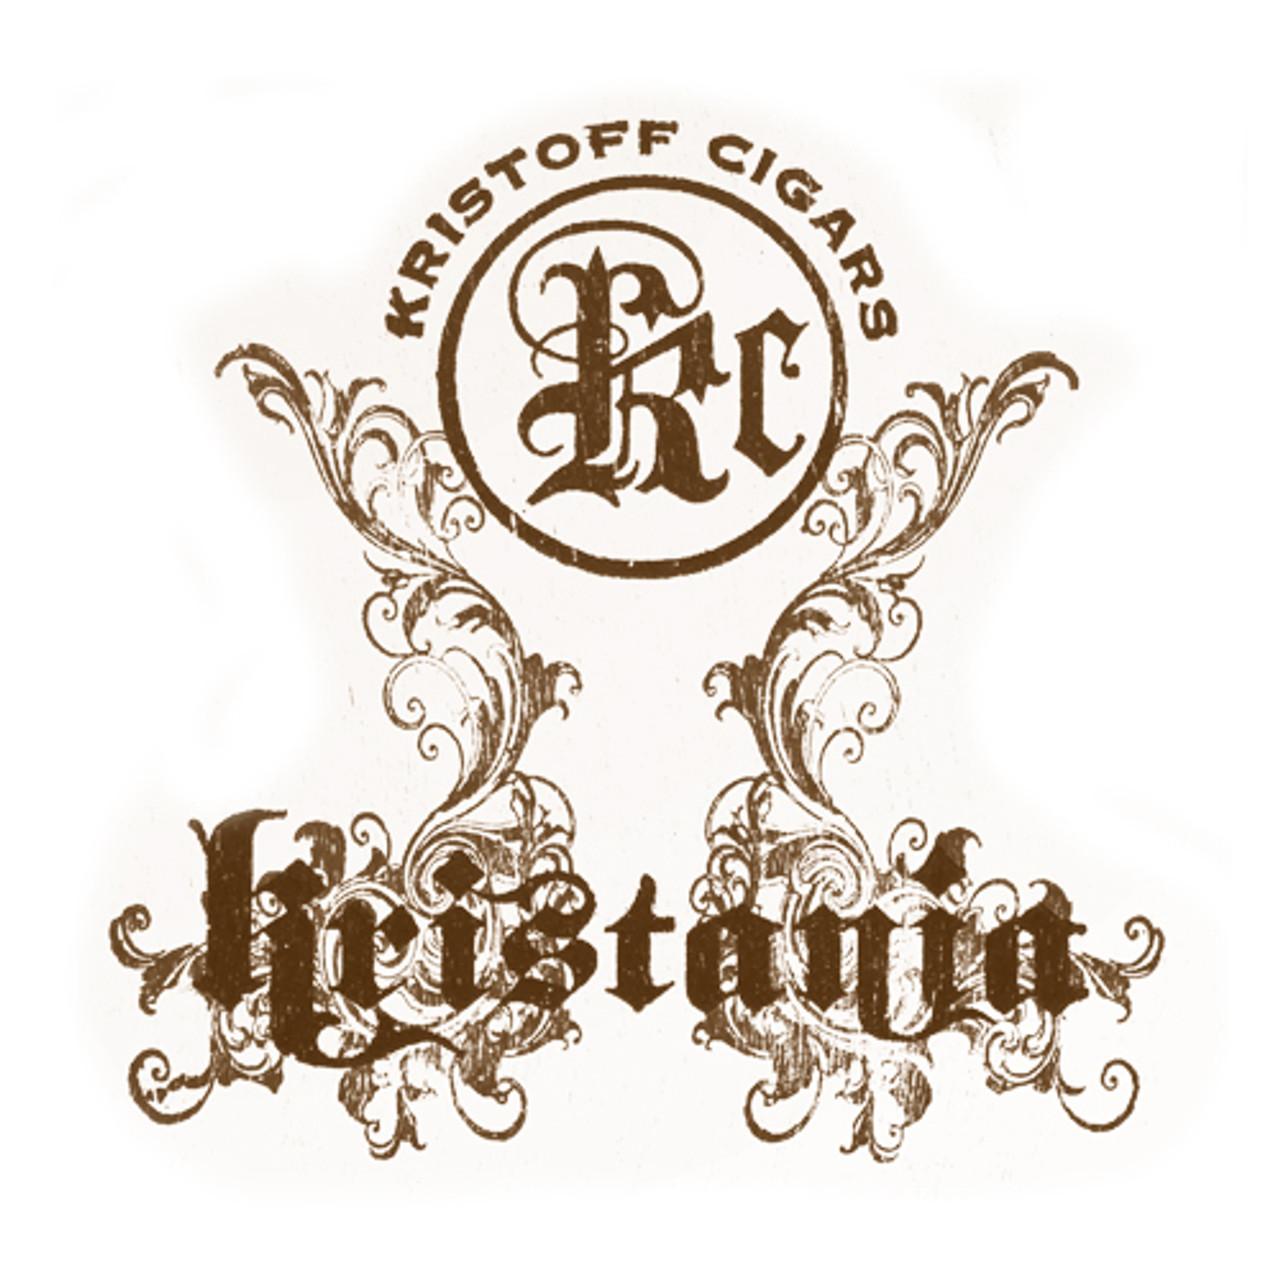 Kristoff Kristania 60 Cigars - 5.5 x 60 (Box of 50)